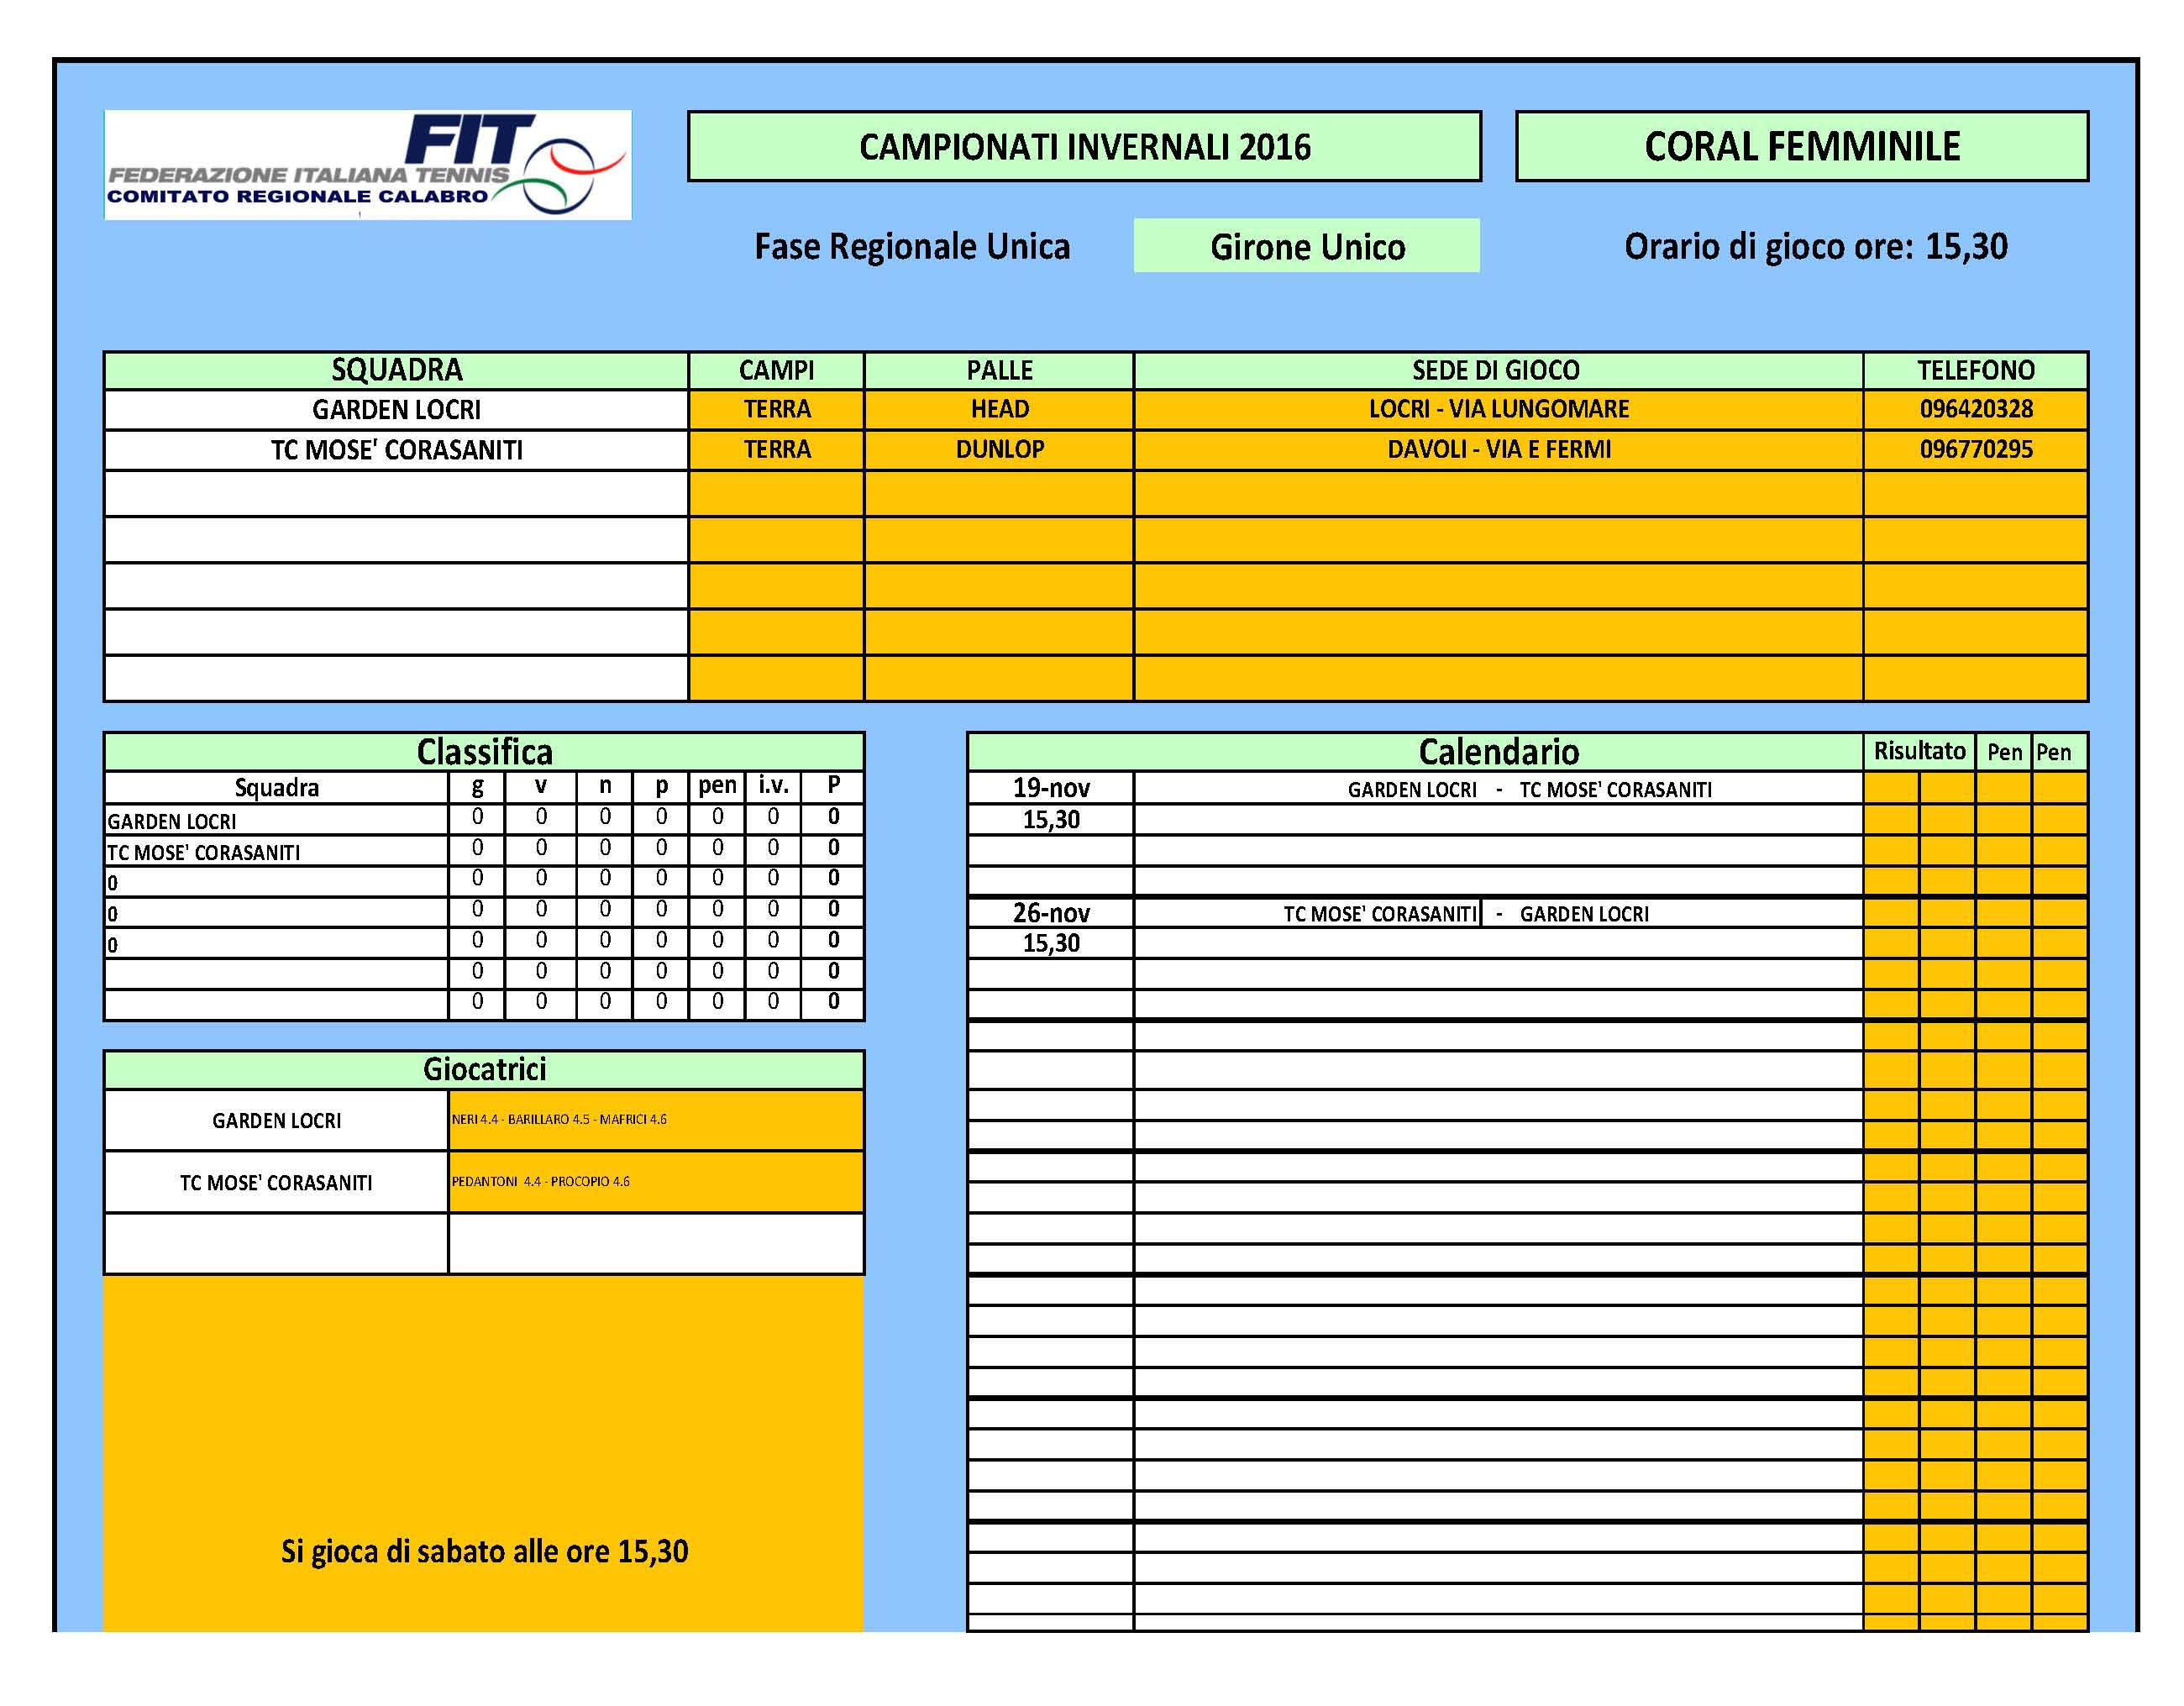 calendario-coral-f-2016